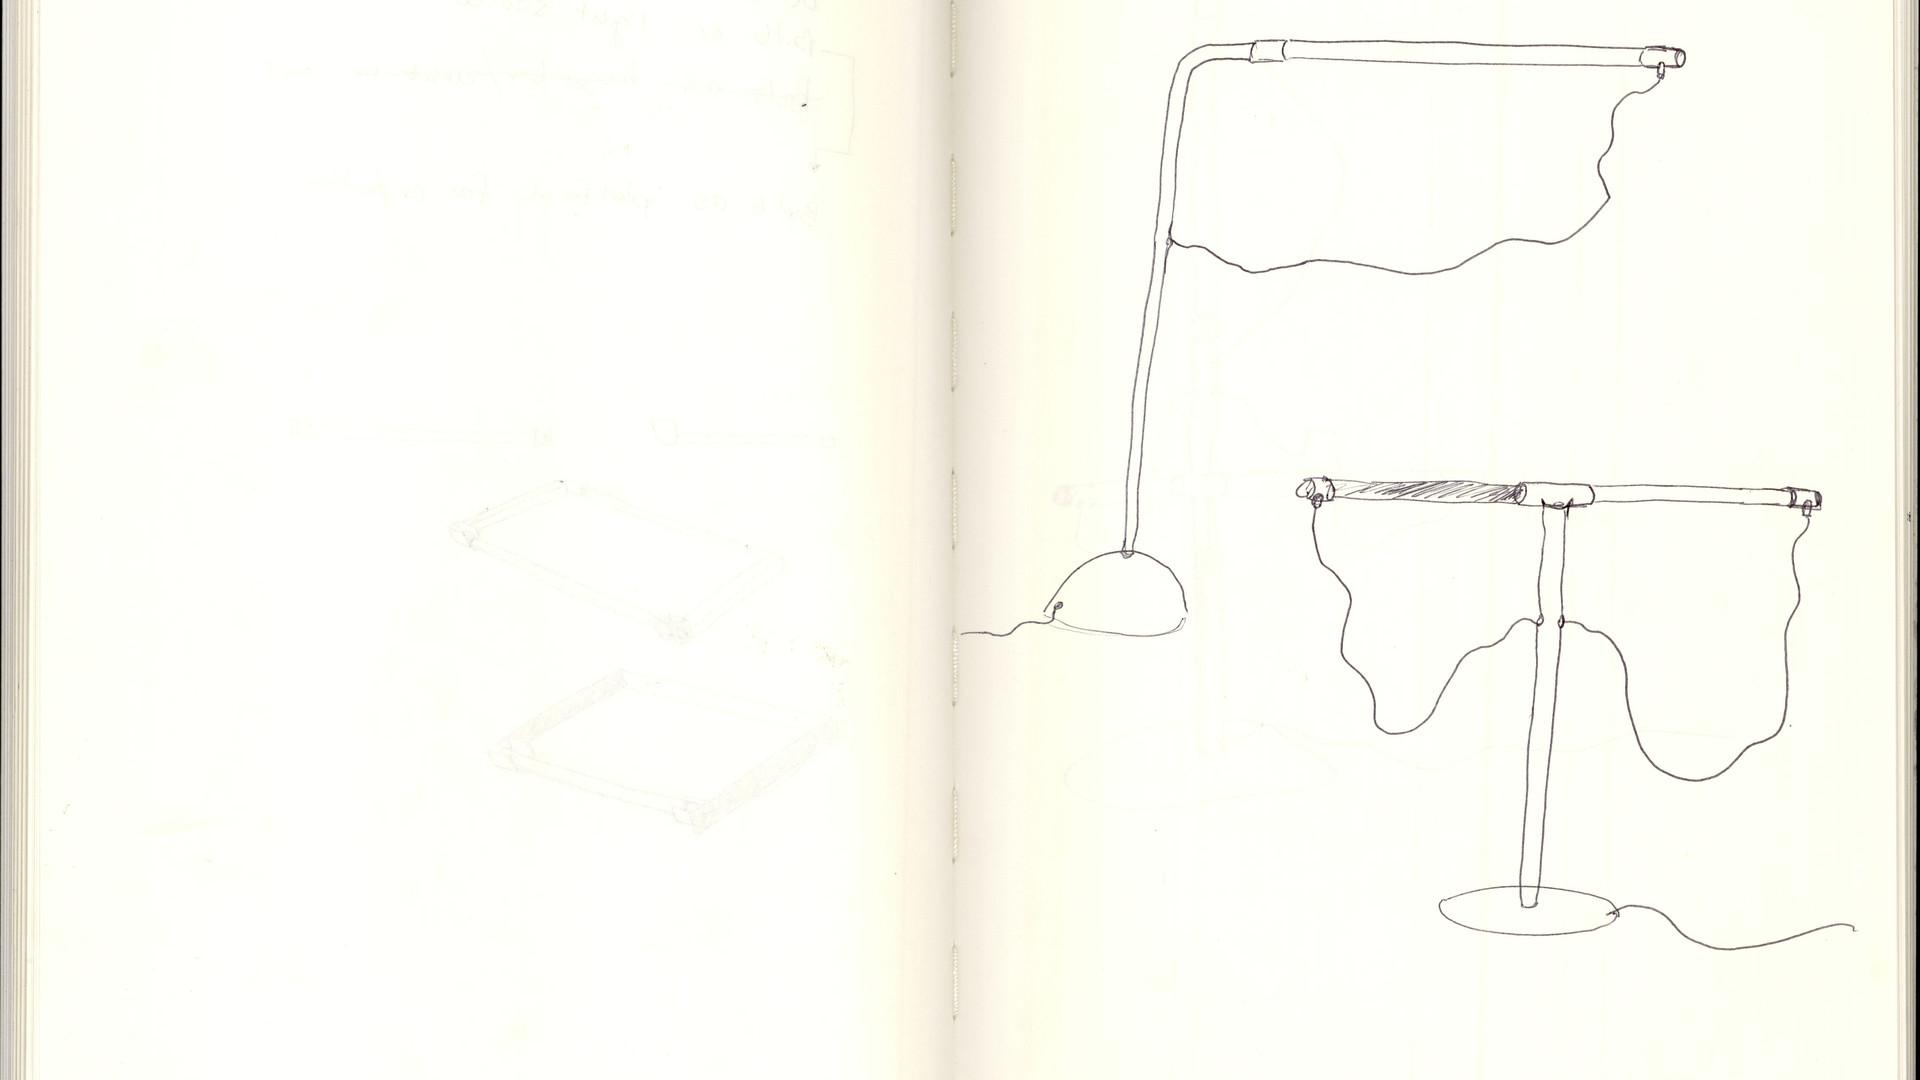 scan1.10 (1).jpg